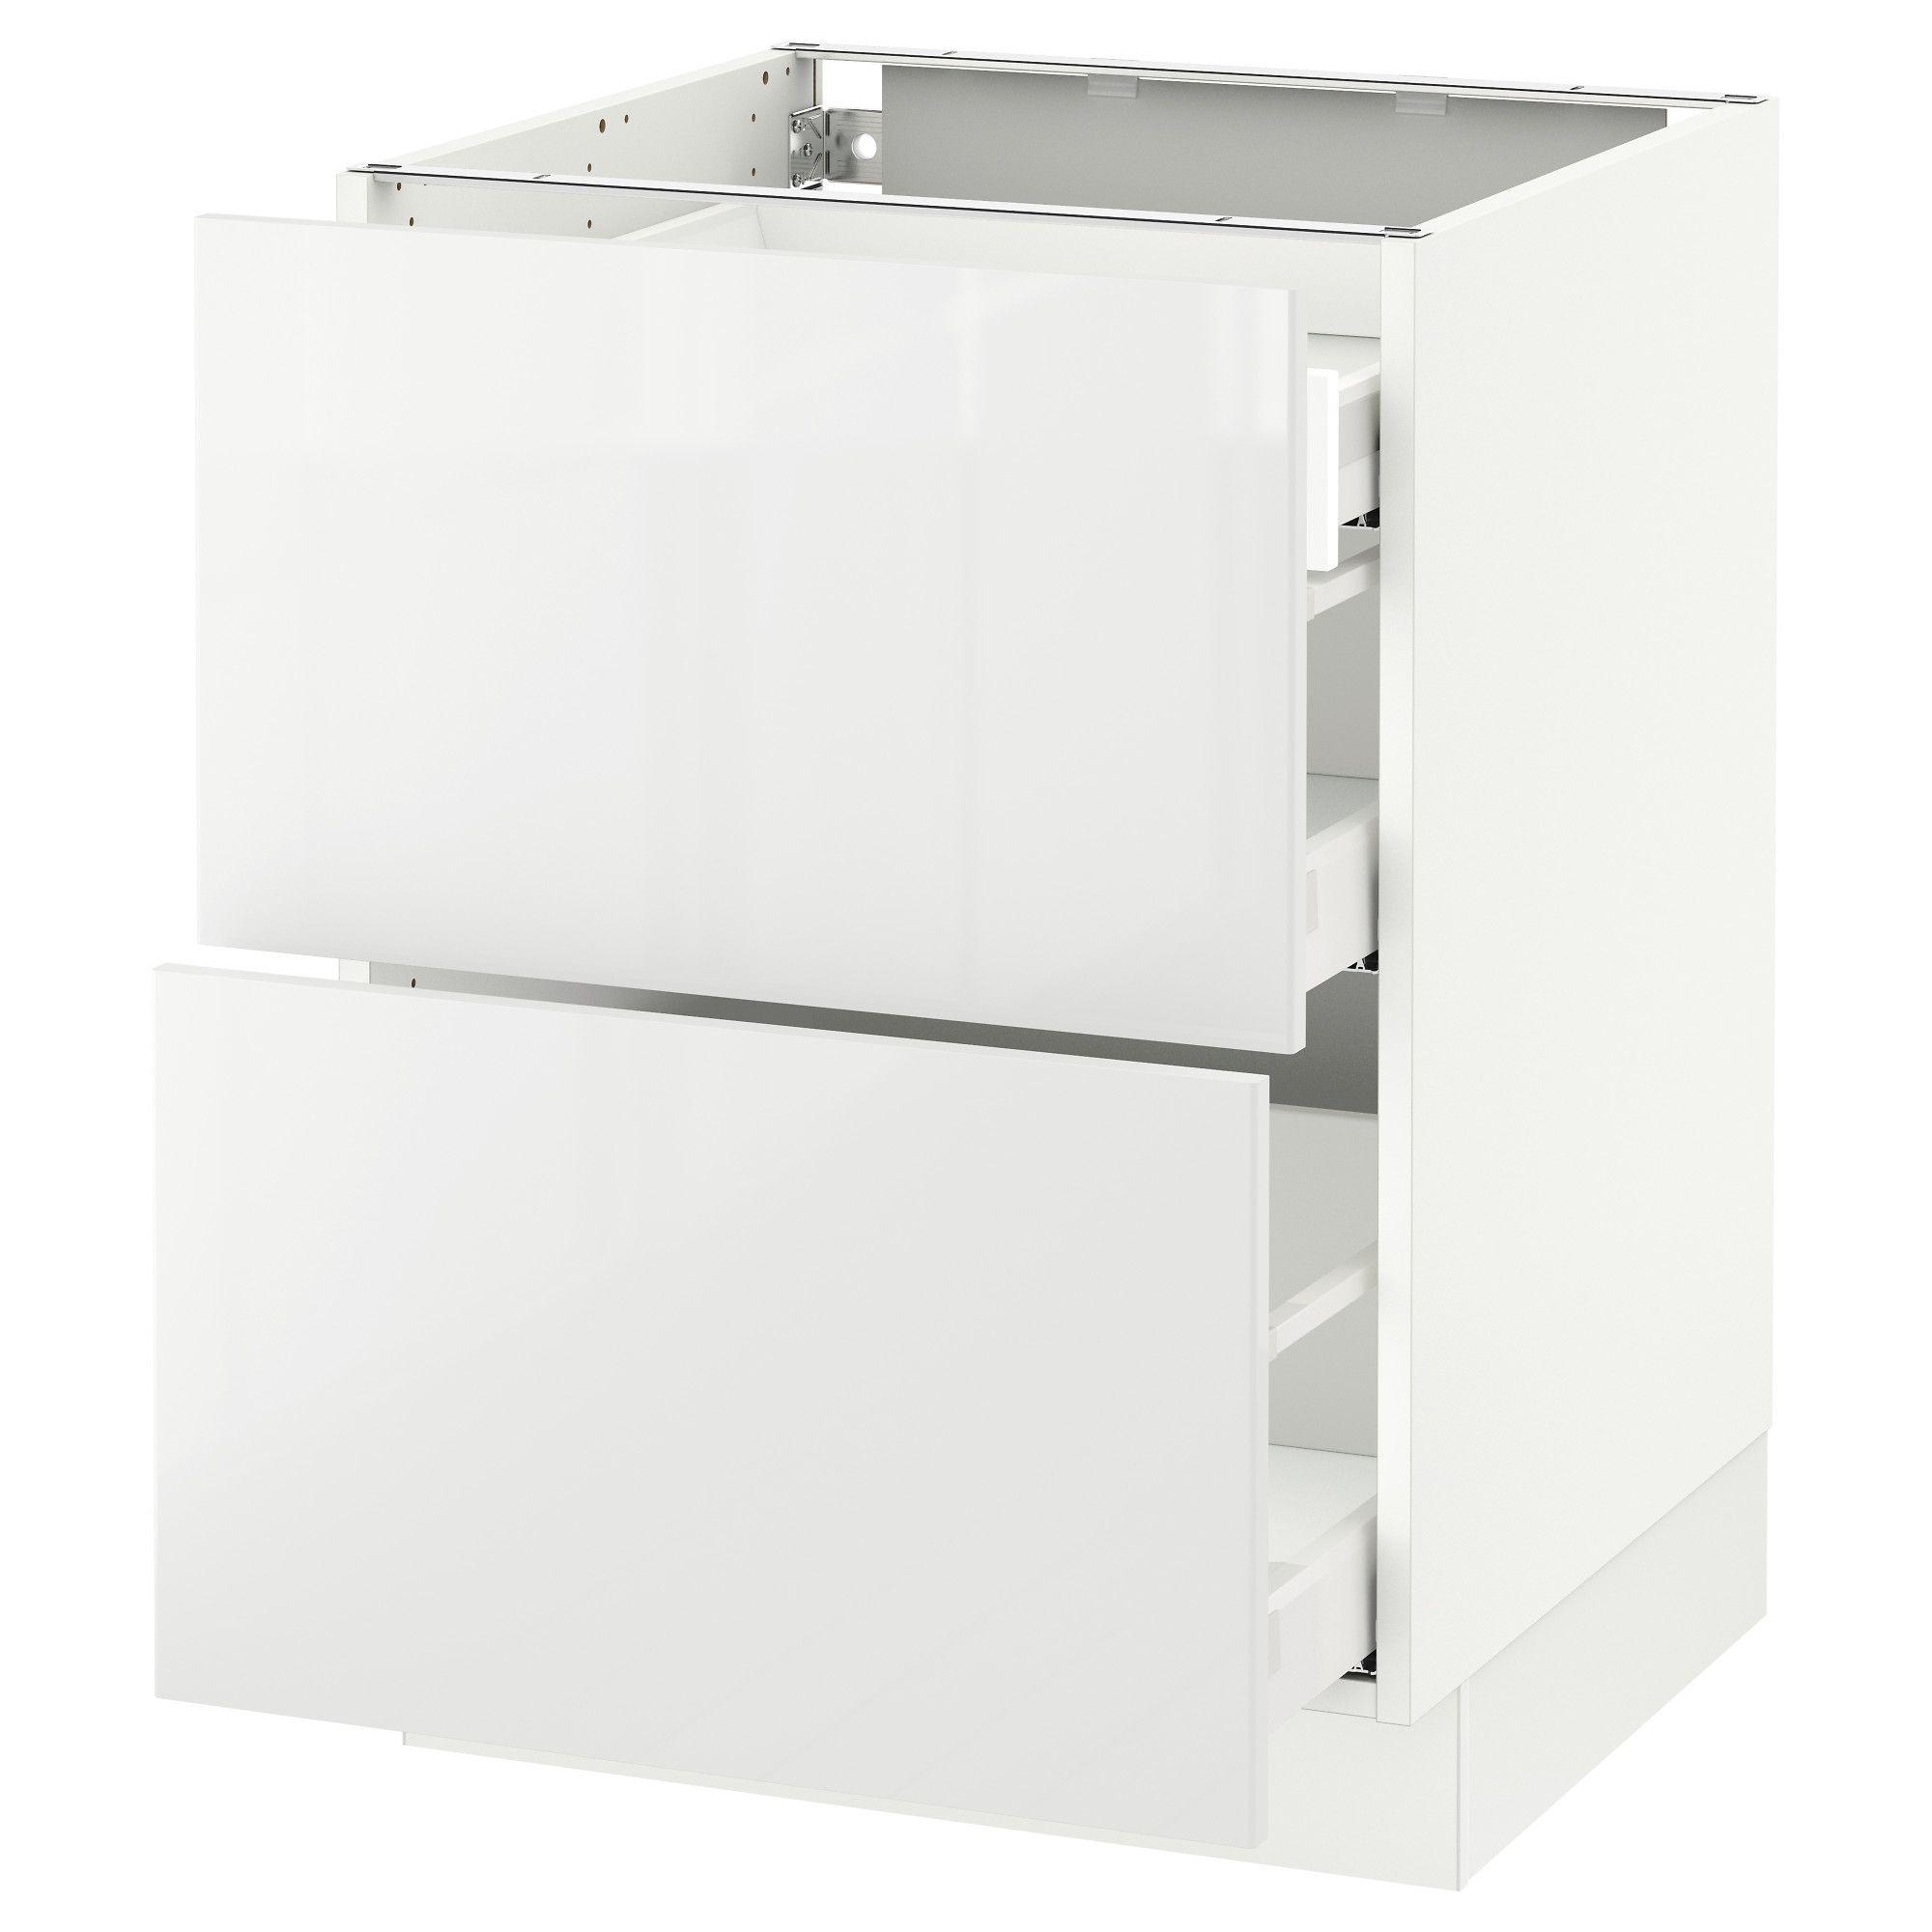 Ikea Sektion Blanc Arm Inf 2 Faces 3 Tiroirs Frame Colour